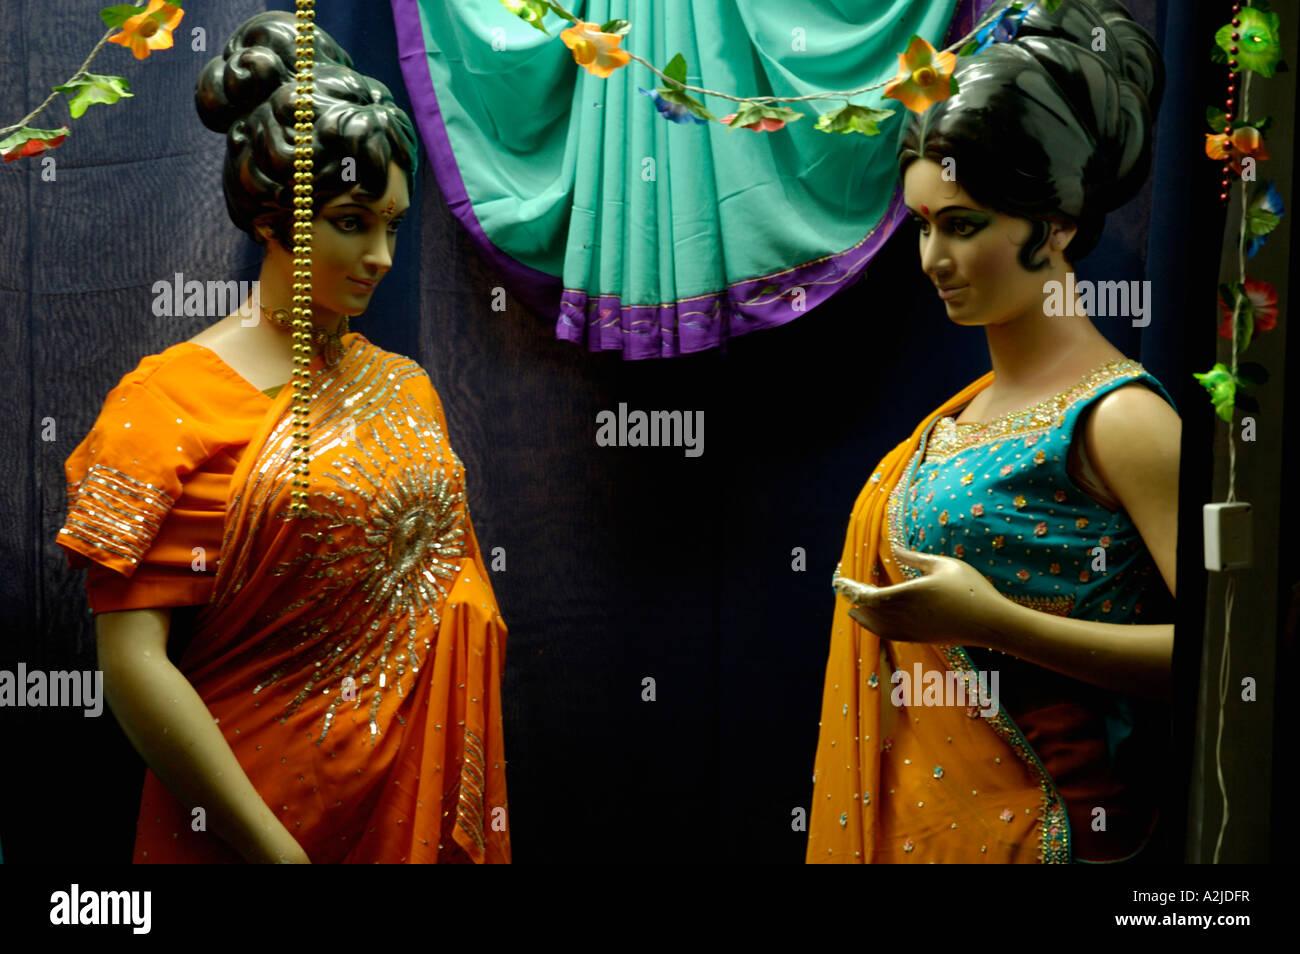 571ec508b04 Indian Clothes Shop Window Stock Photo  10535242 - Alamy